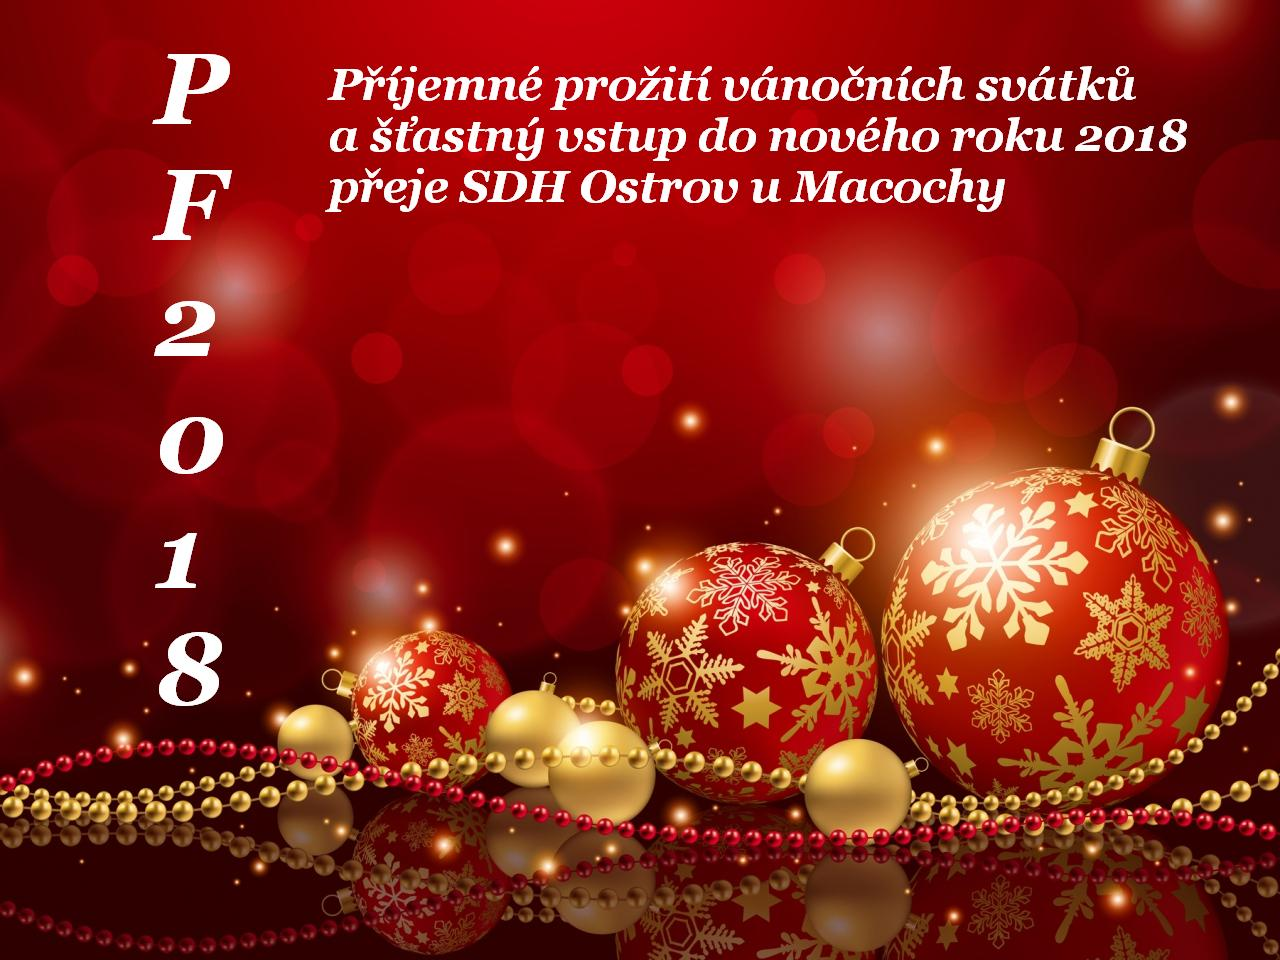 PF 2018 SDH